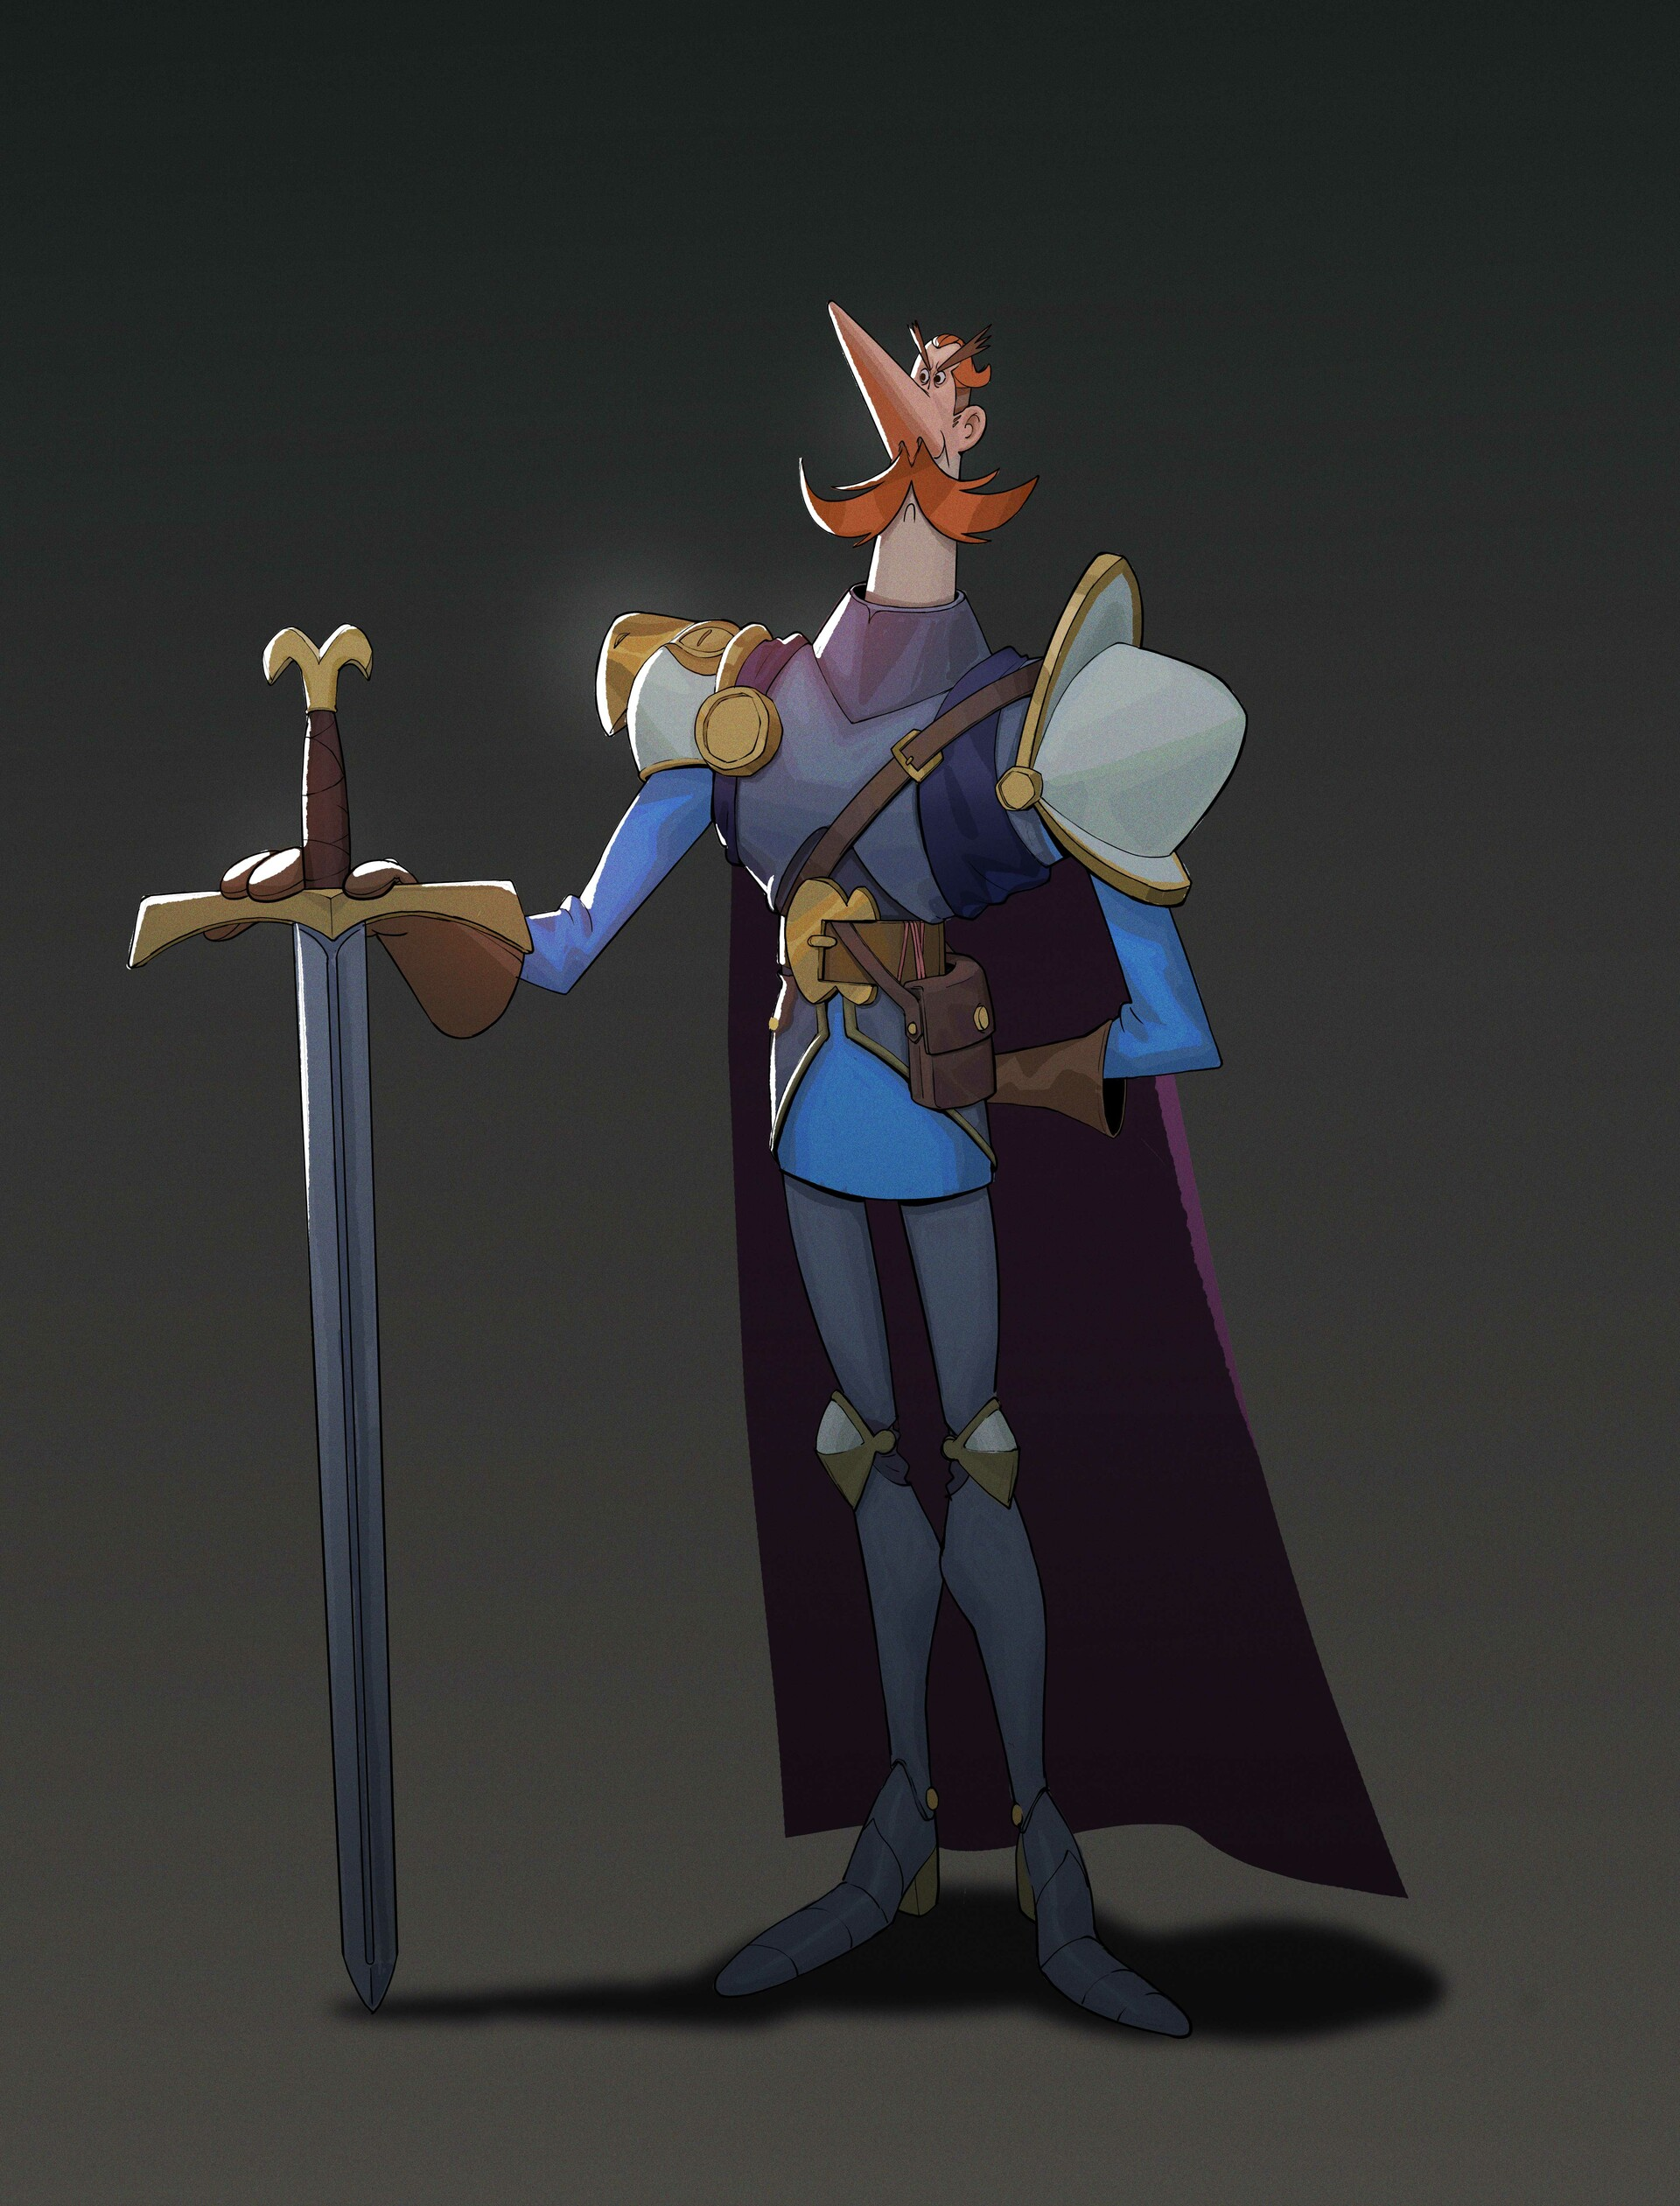 Sir Lancrlot the III